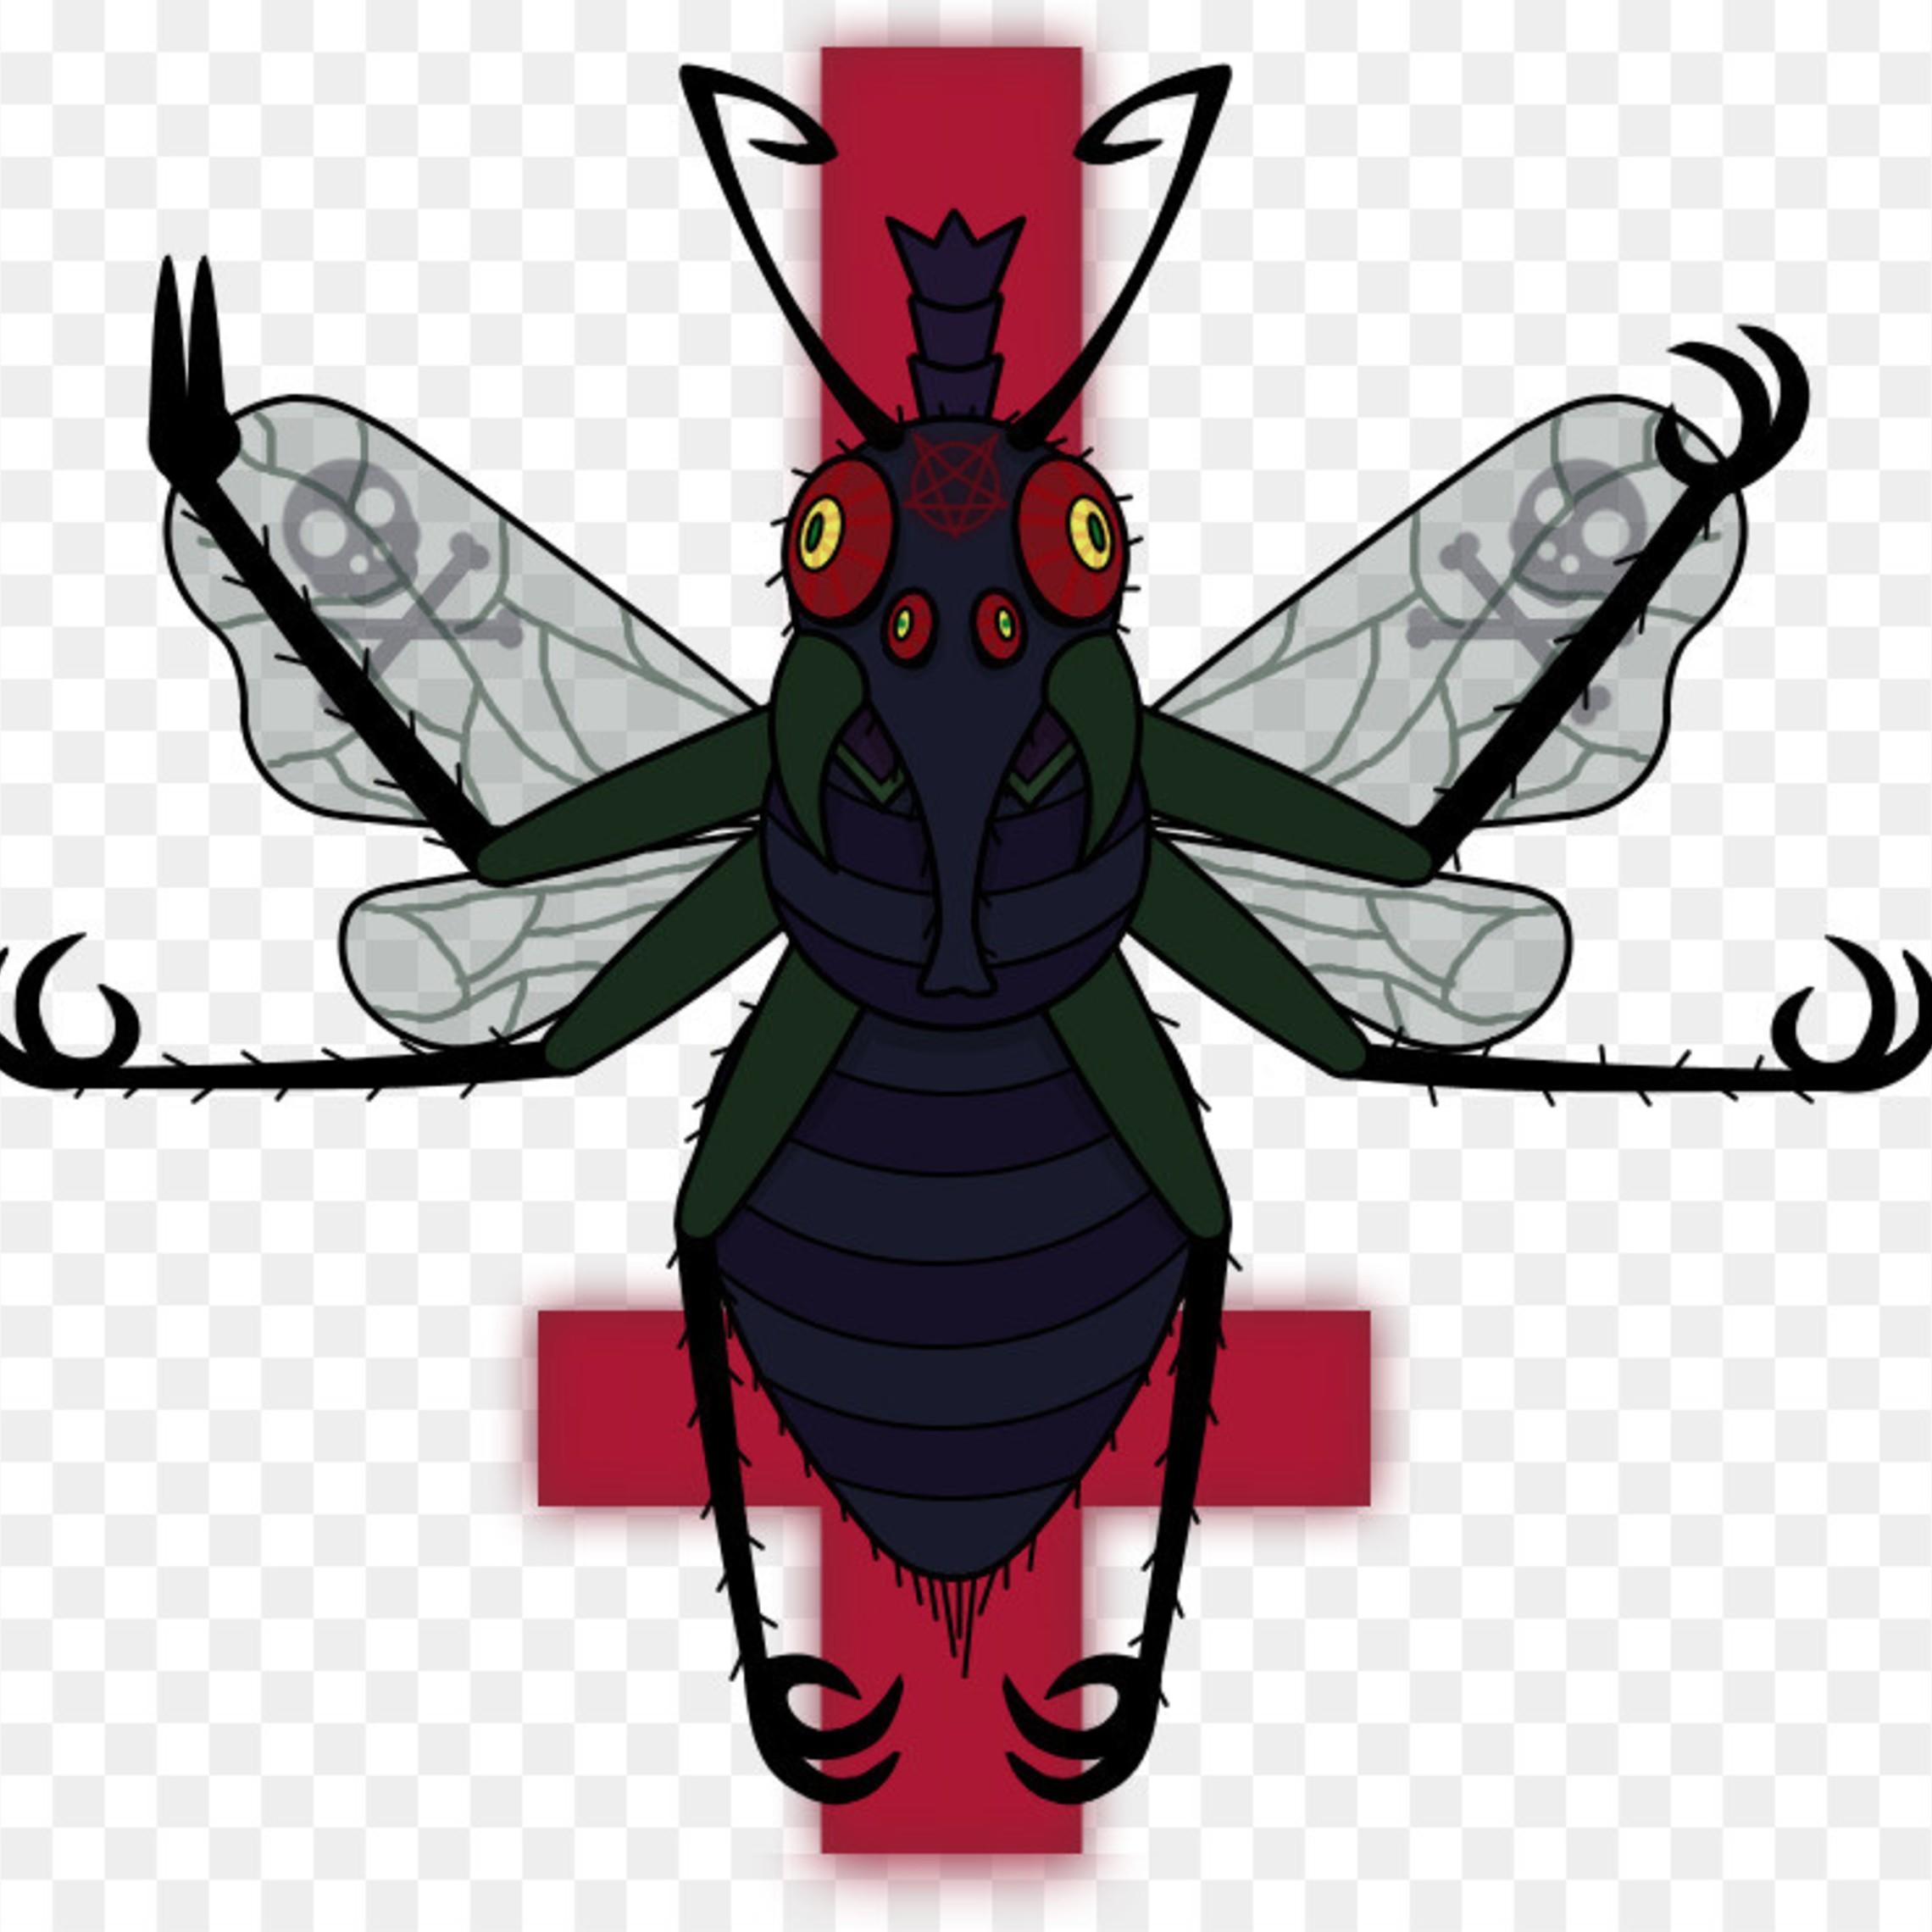 Beelzebub Lord Of The Flies Fly Devil Demon 5aeea8b12b1724.4720108315255901931765